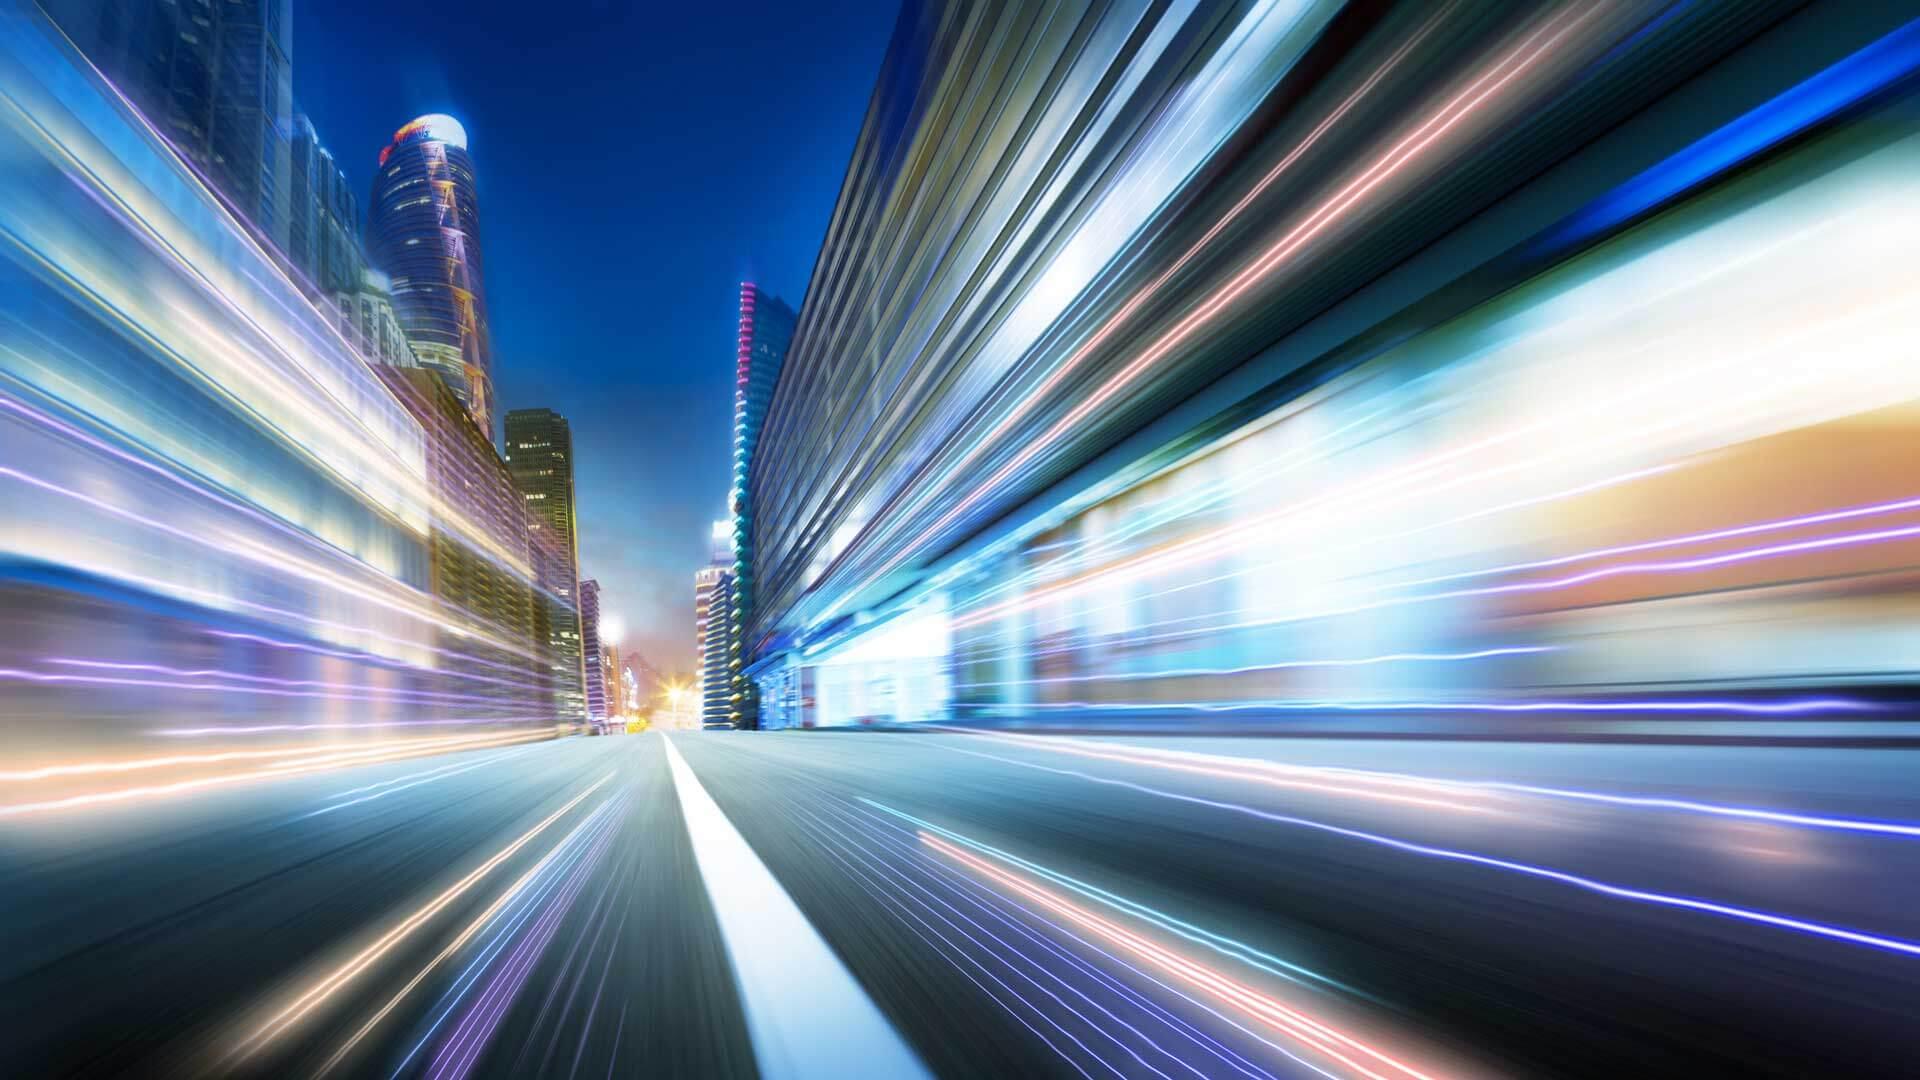 velocity-speed-blur-motion-ss-1920_gmua0y